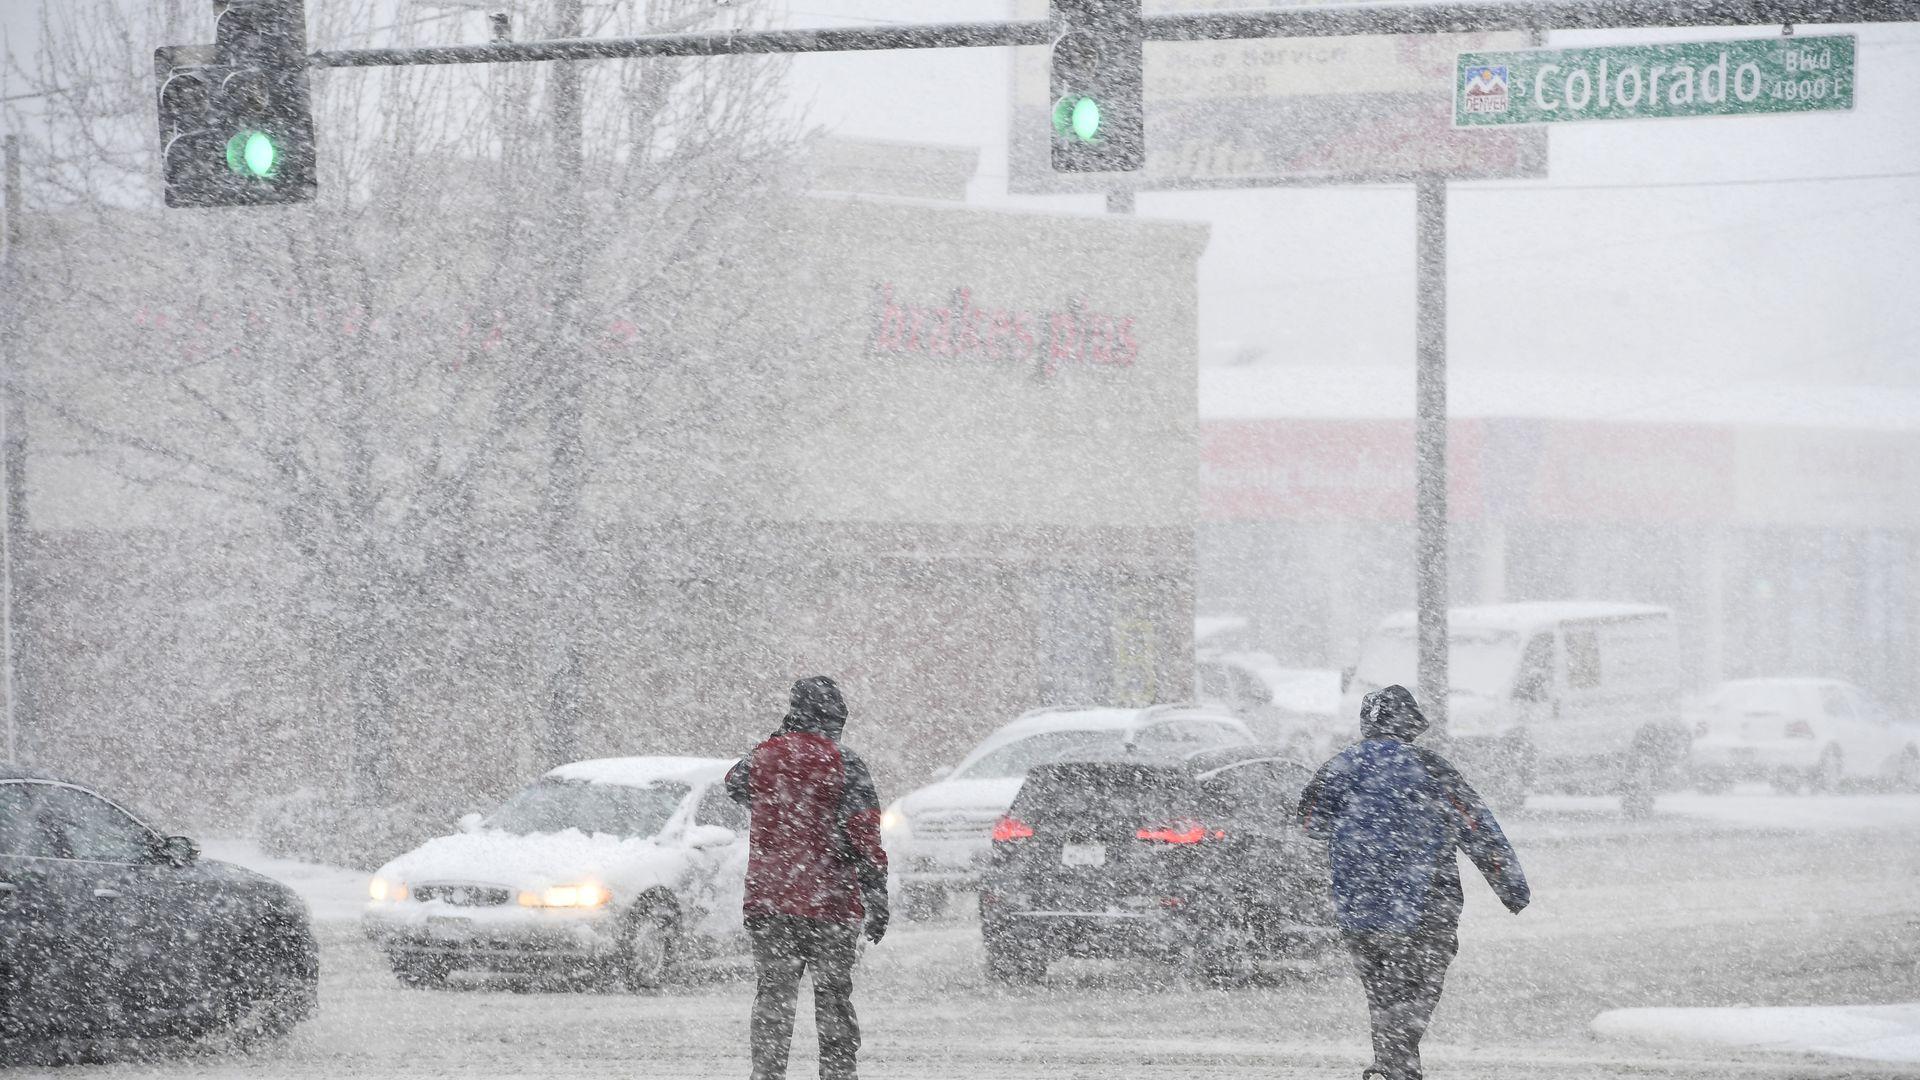 A snowstorm in Denver